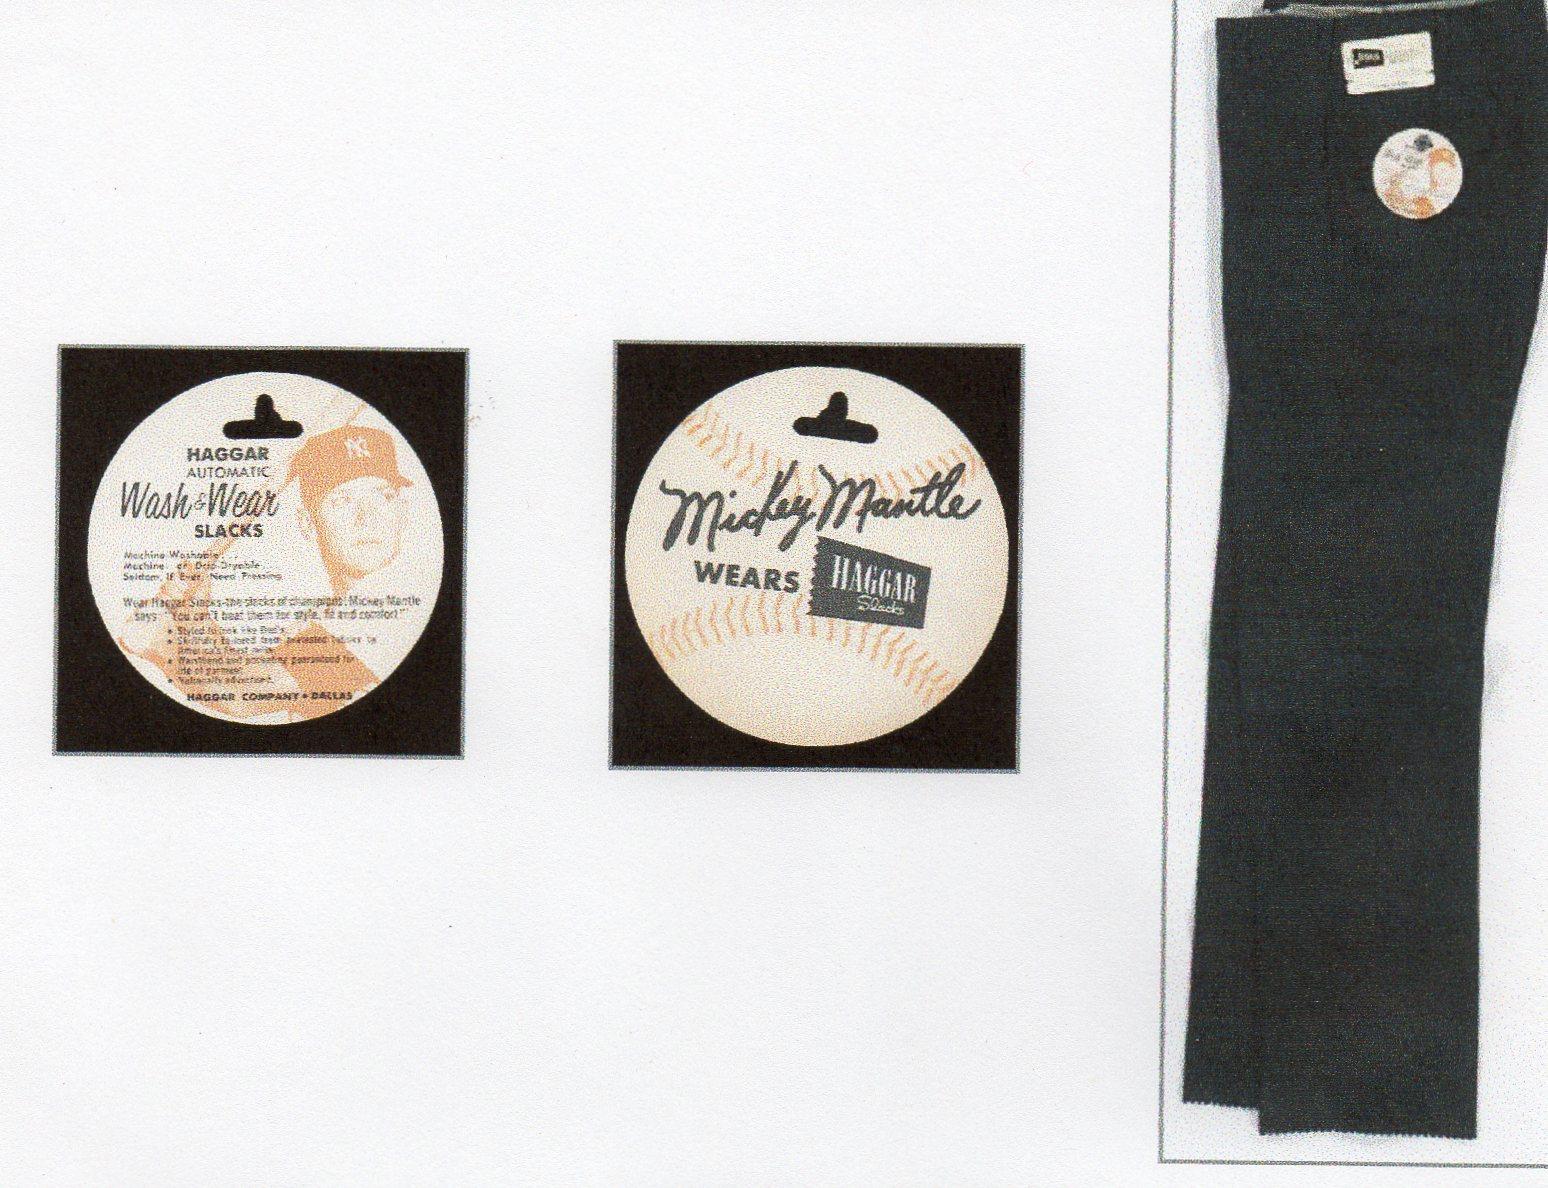 1958 haggar slacks tag